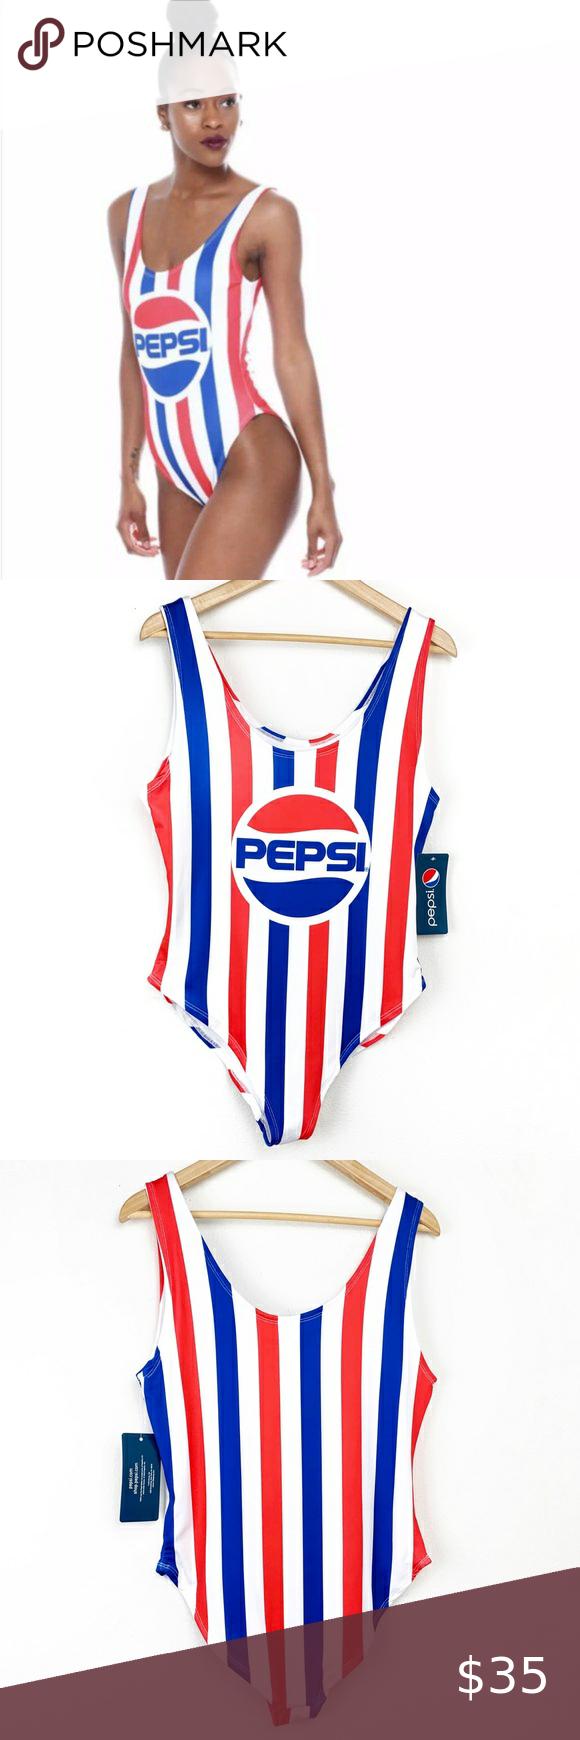 Pepsi Logo Striped Retro One Piece Swim Suit NWT in 2020